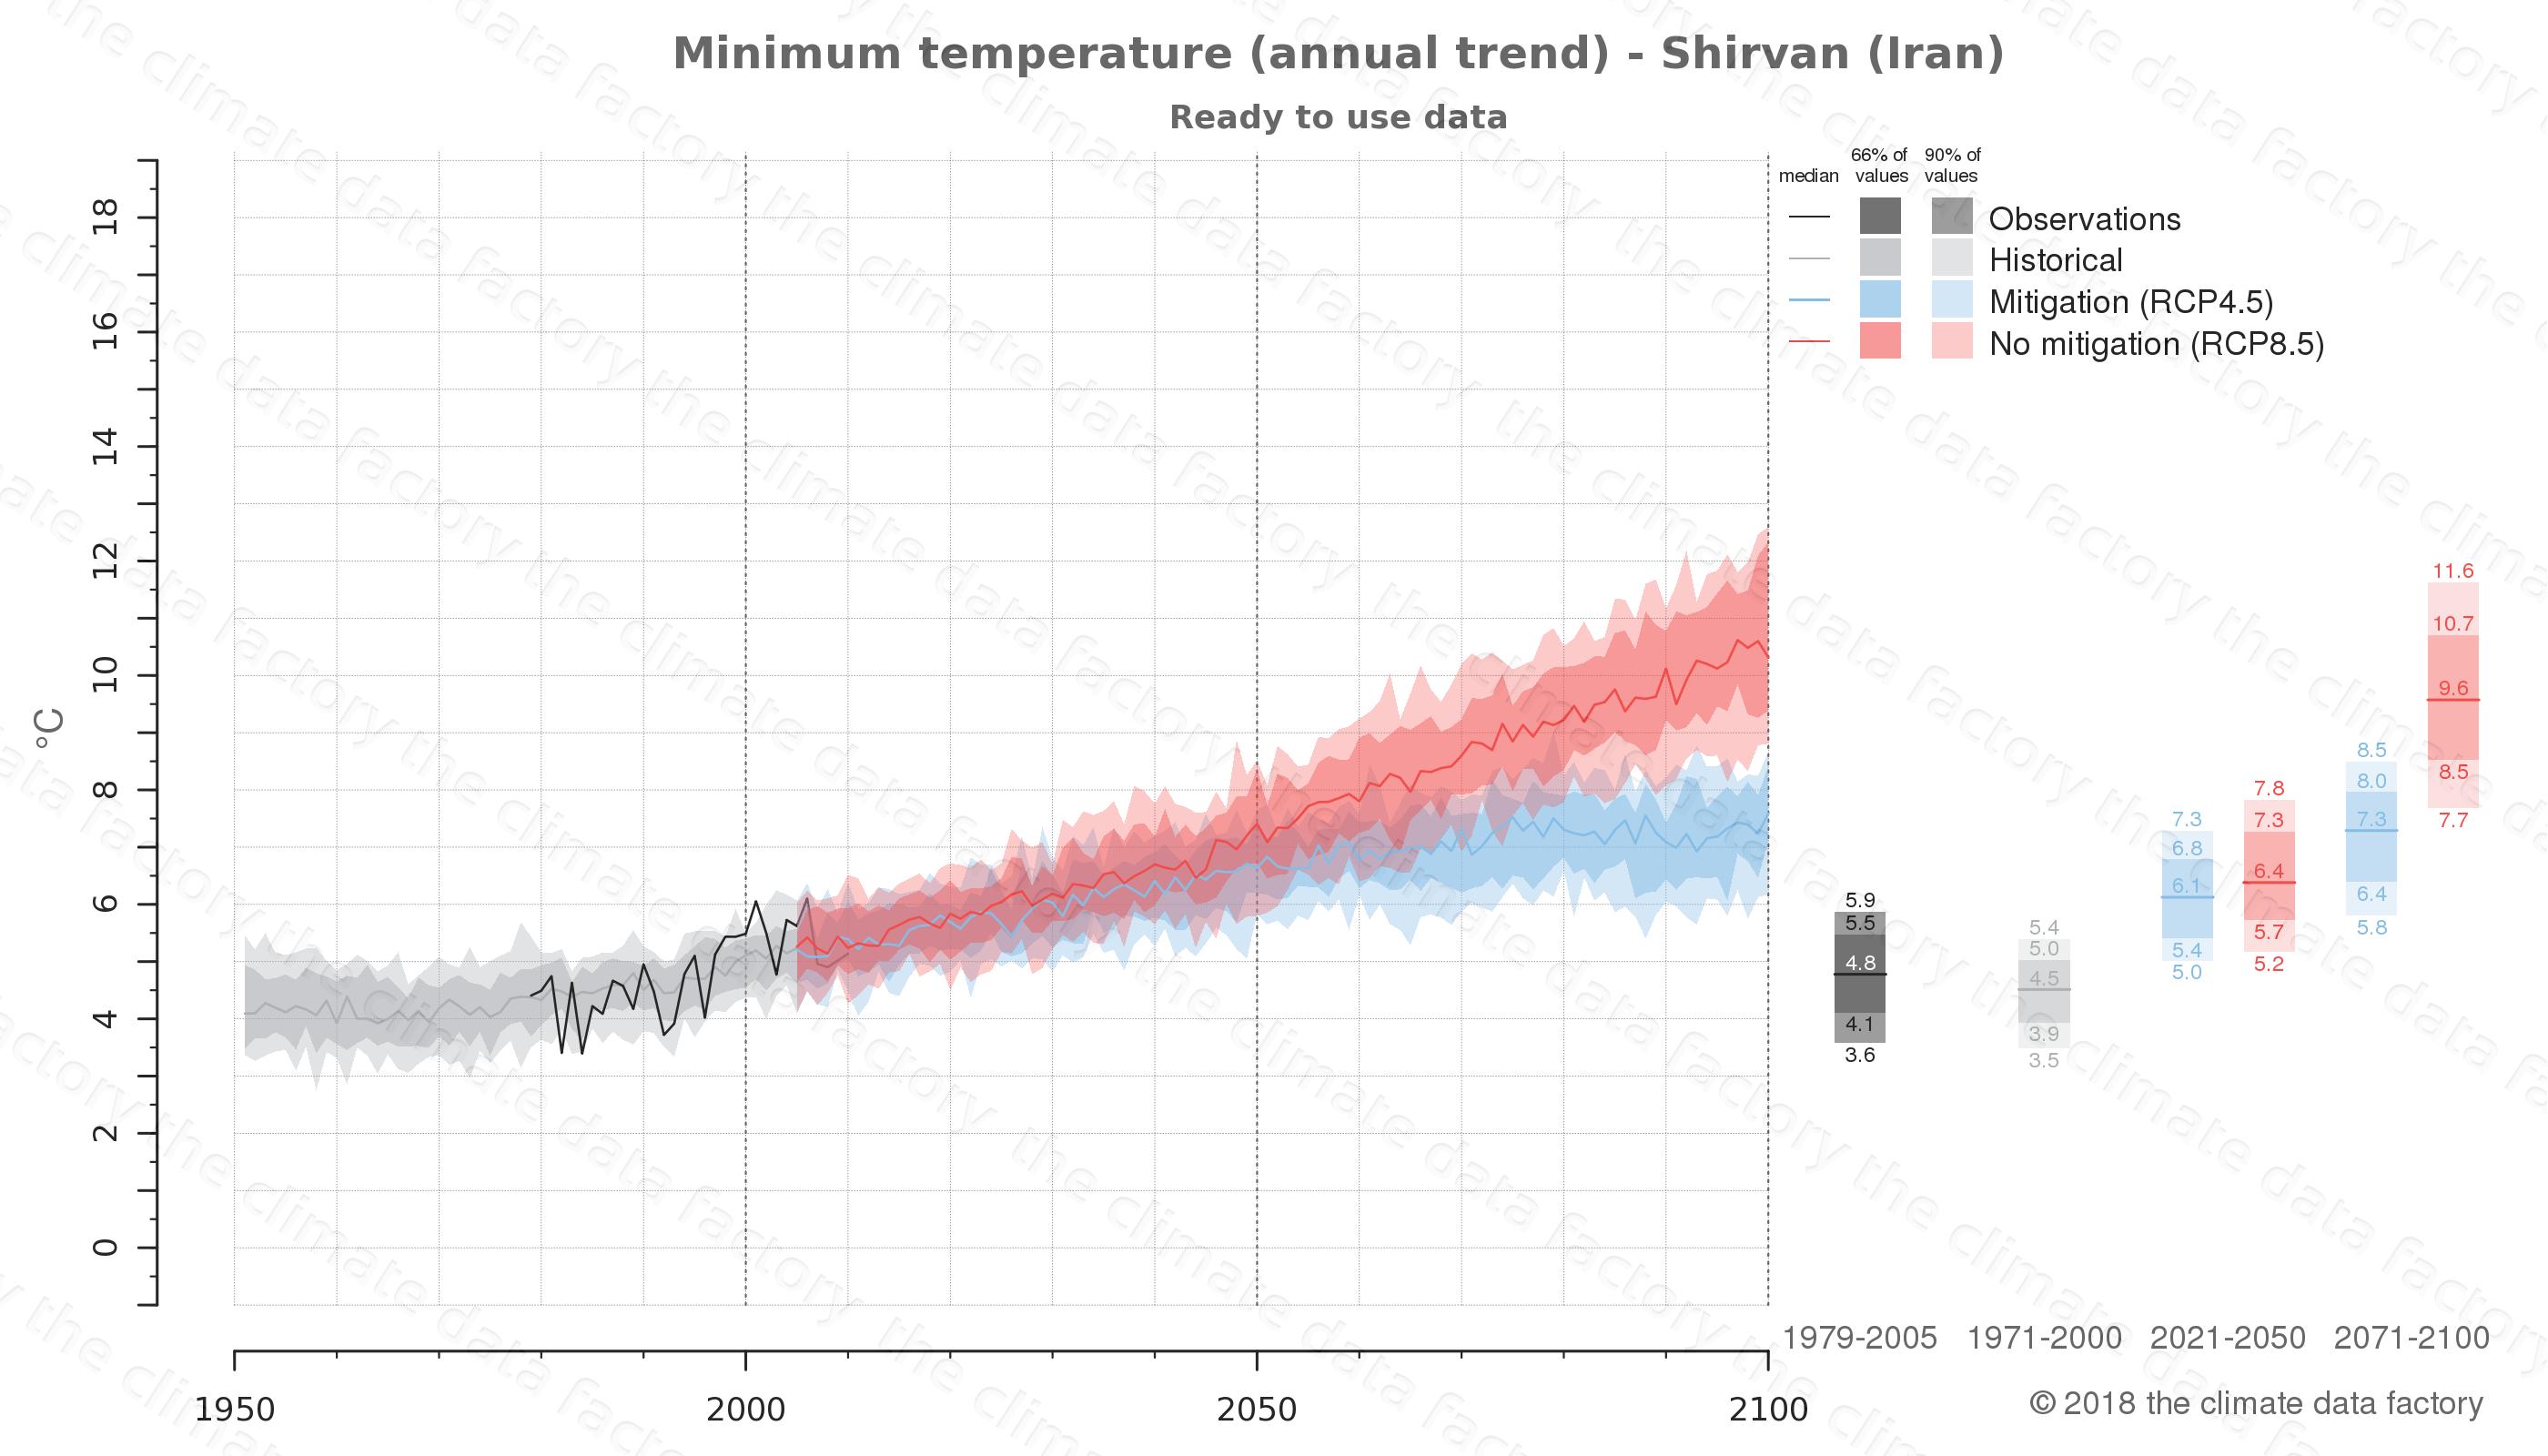 climate change data policy adaptation climate graph city data minimum-temperature shirvan iran